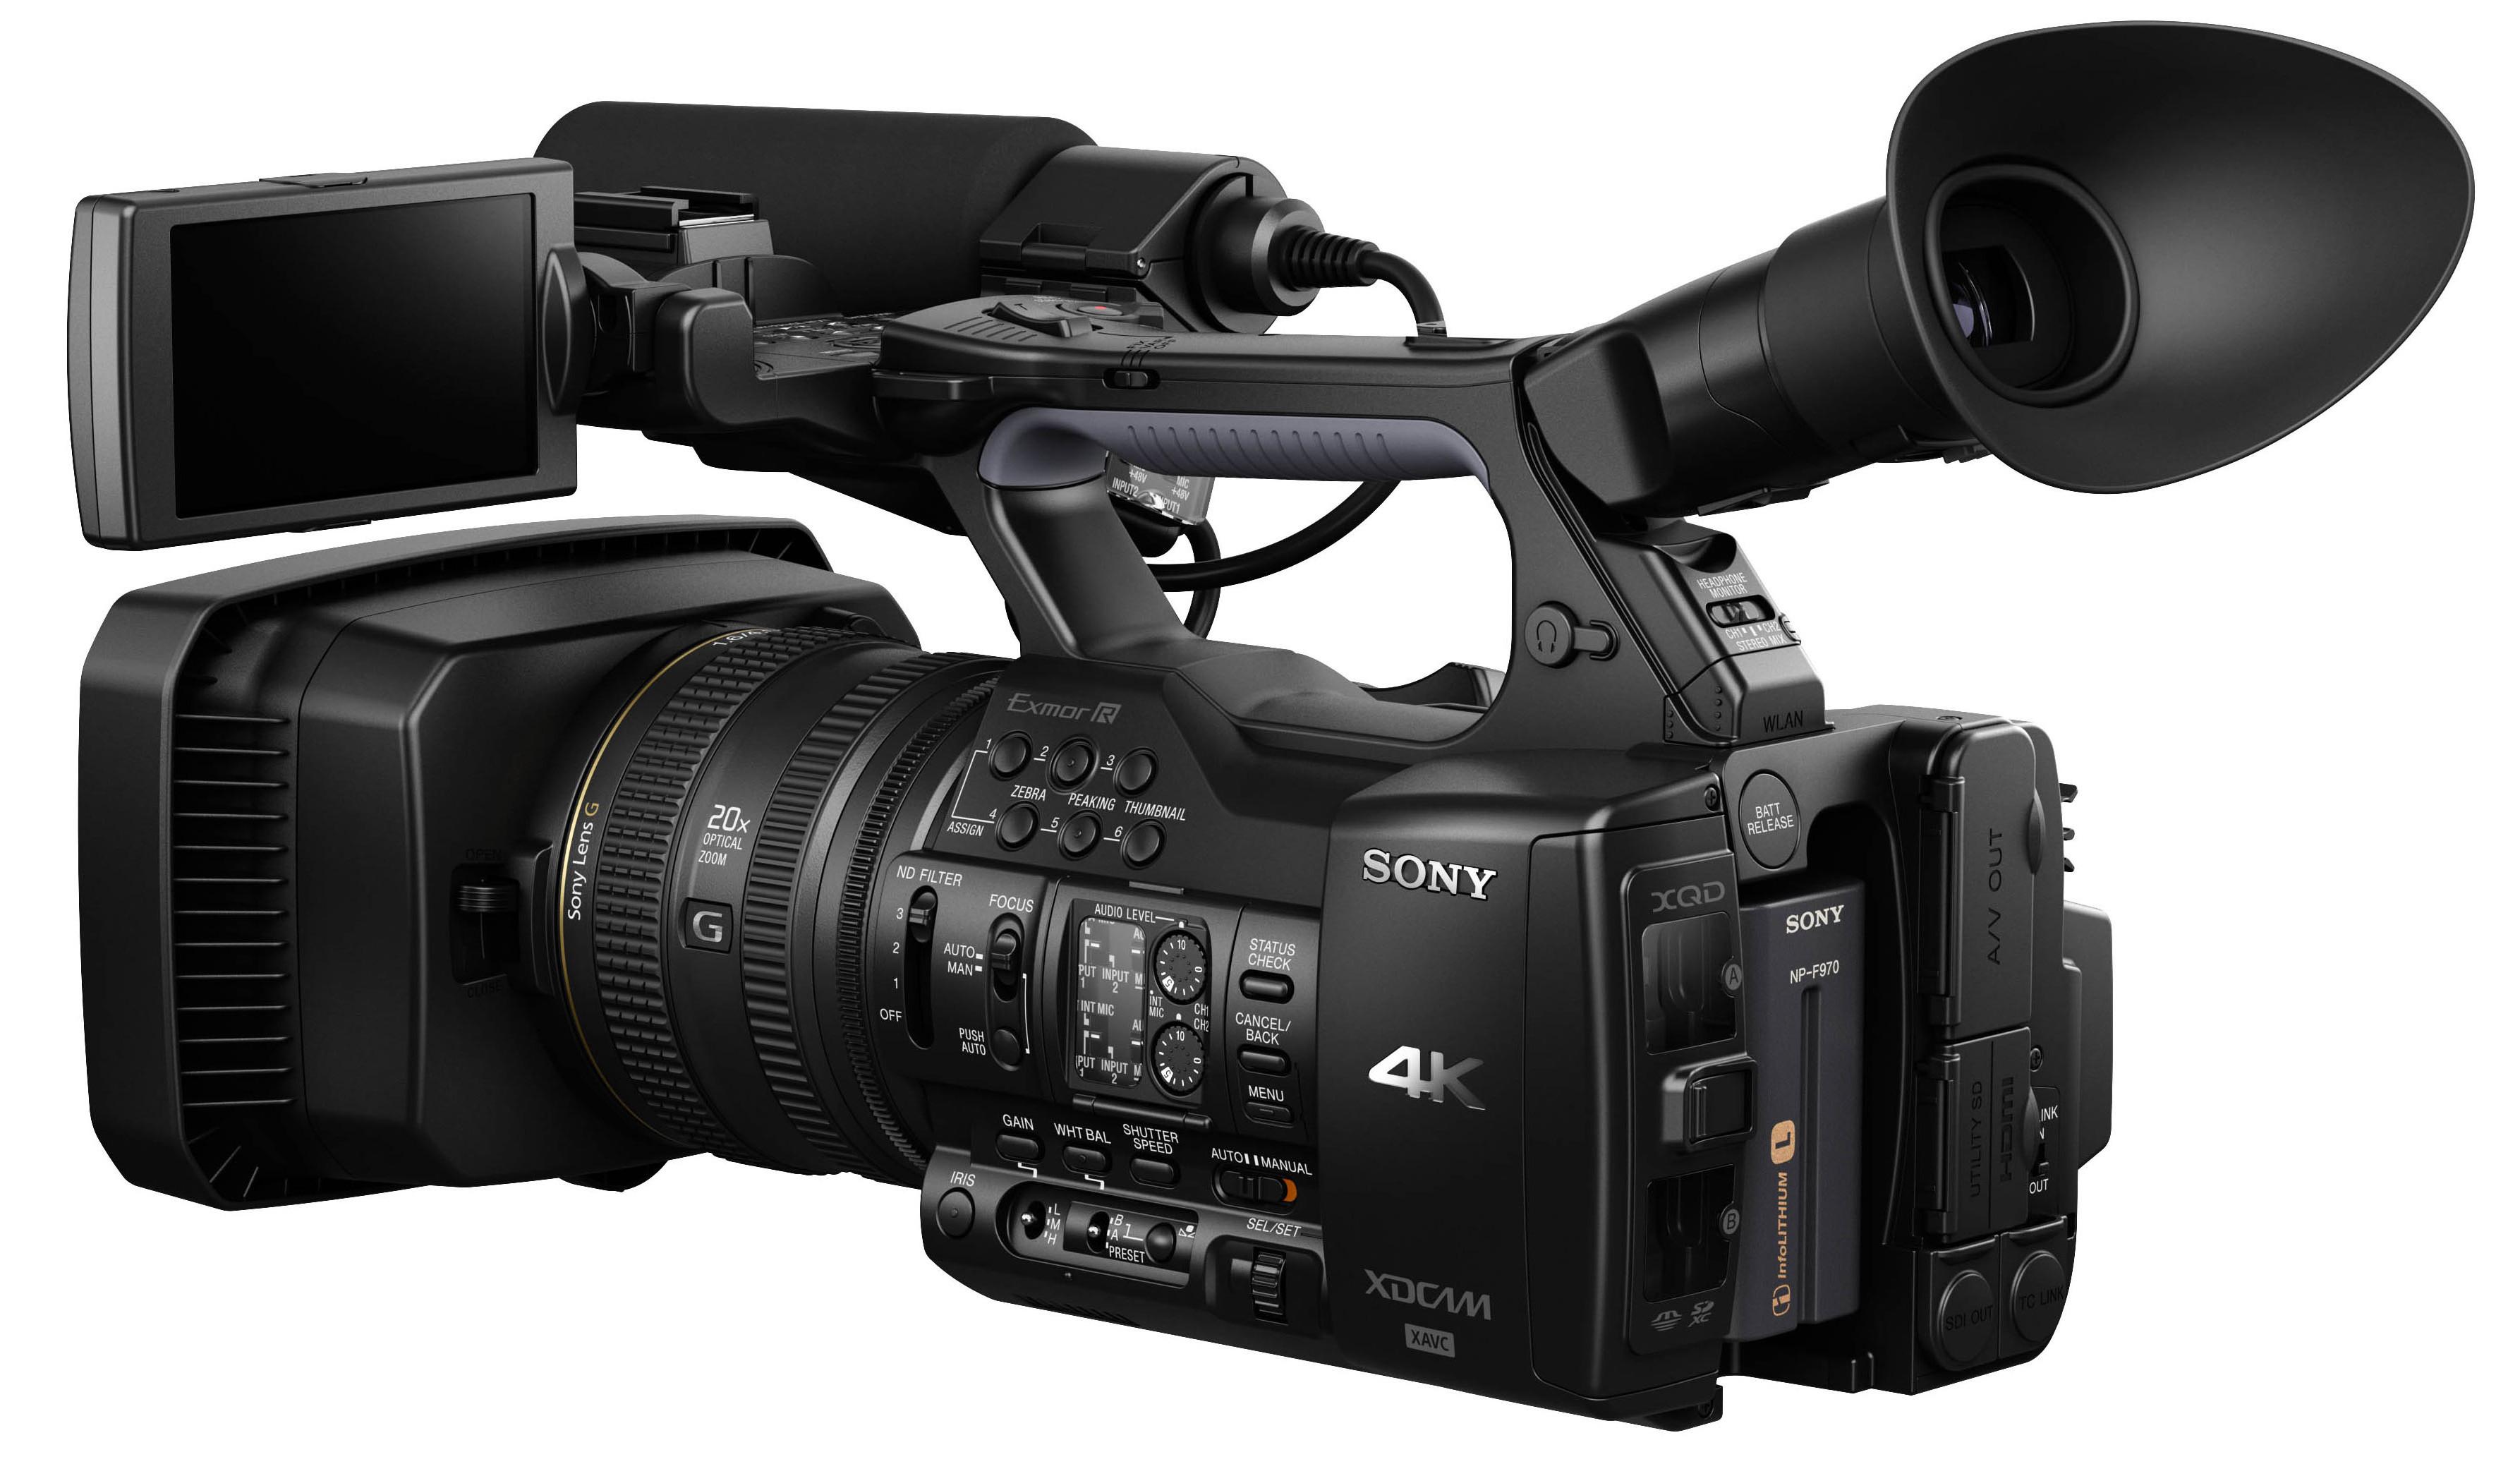 Sony announces pxw z100 ushers era of 4k camcorder - Tv in camera ...